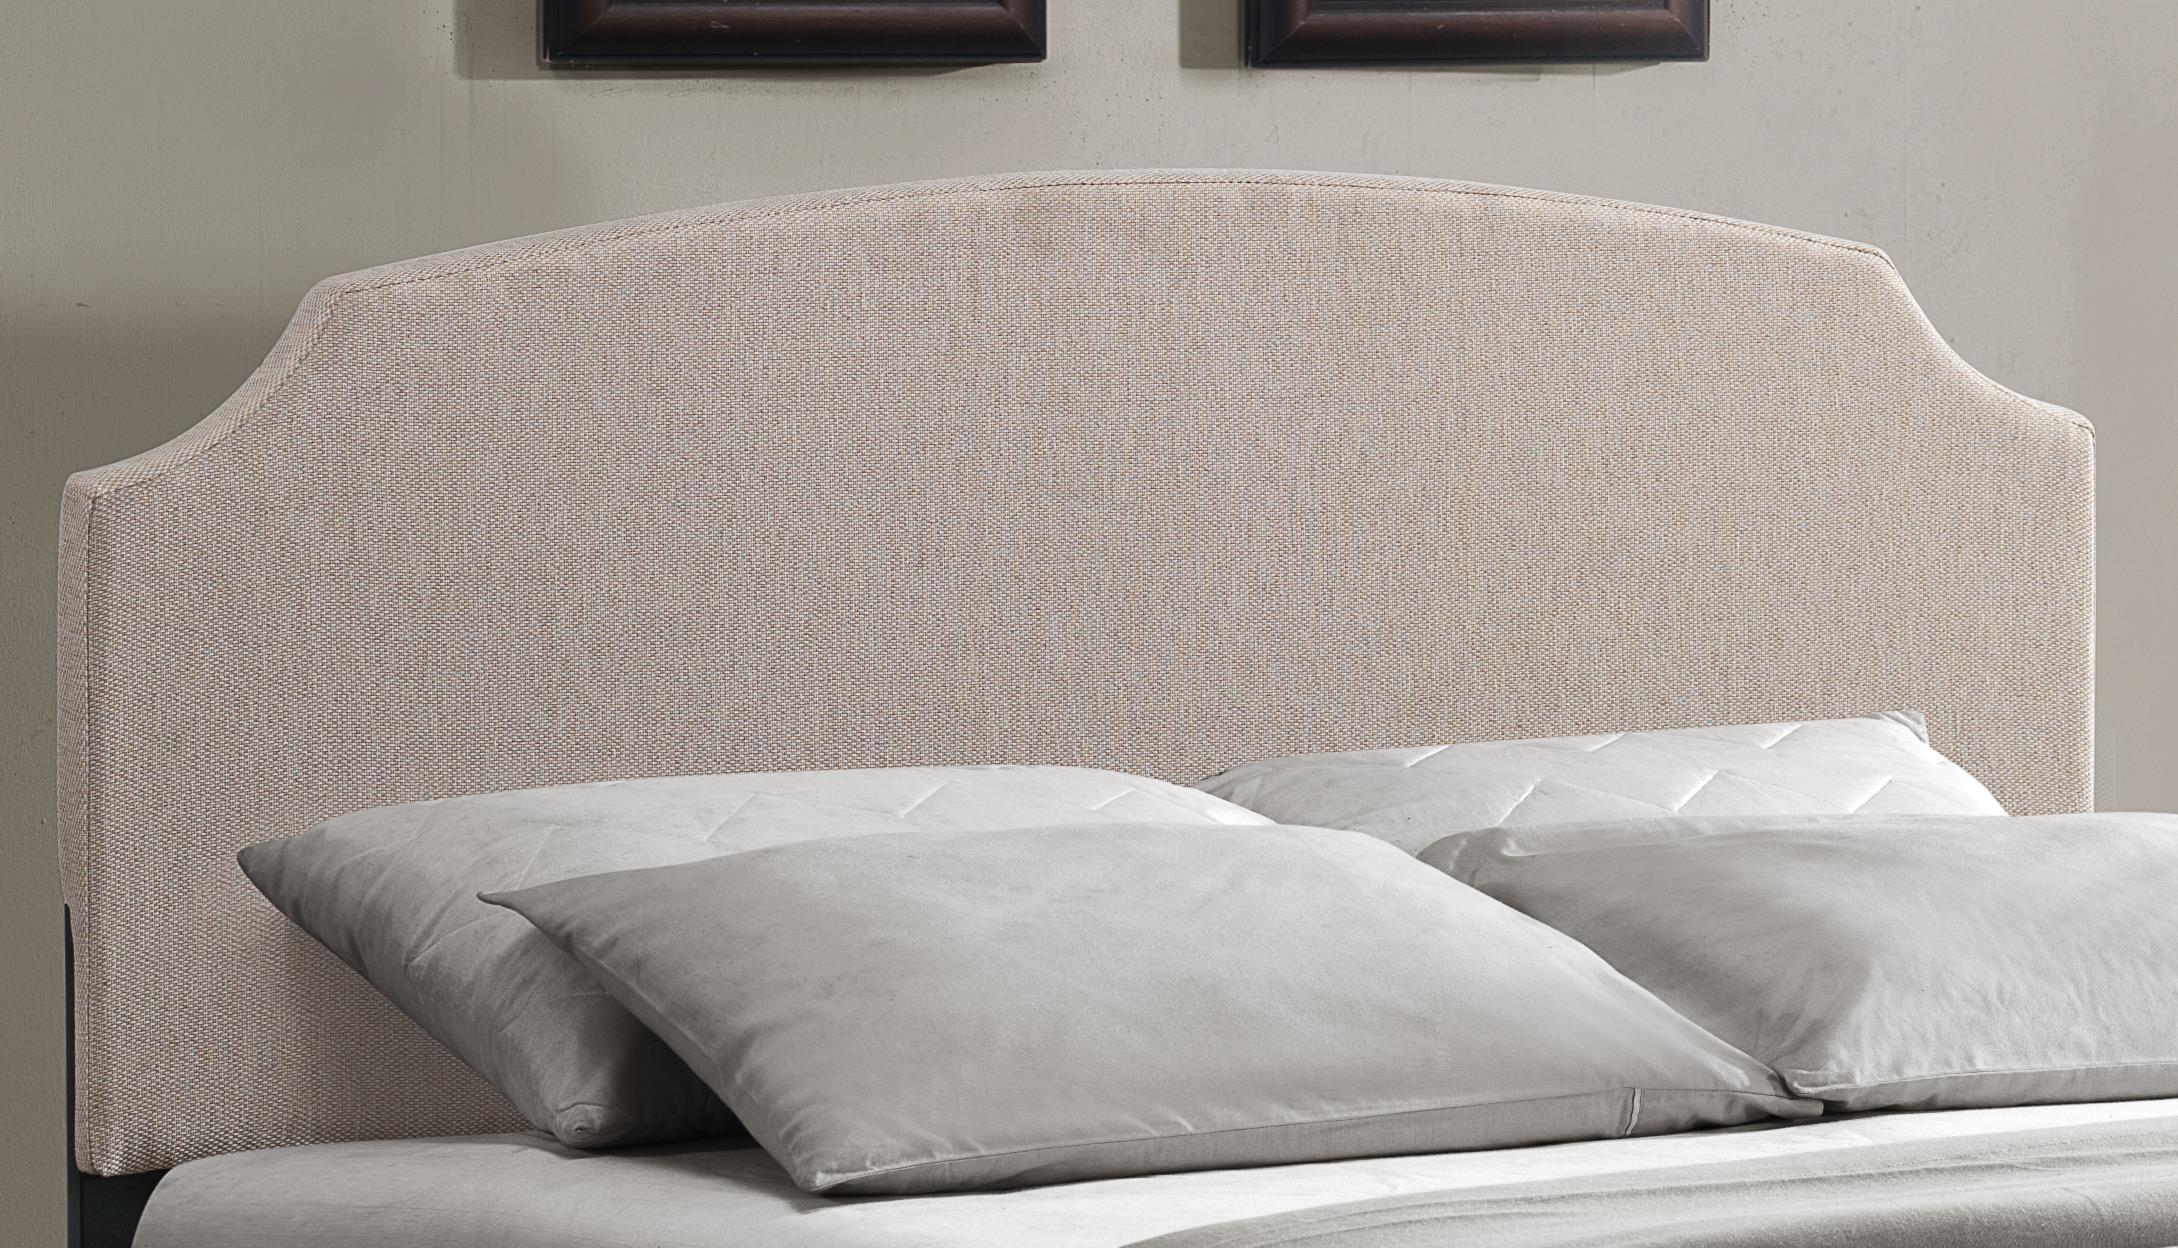 Upholstered Beds Lawler Full Headboard Set by Hillsdale at Steger's Furniture